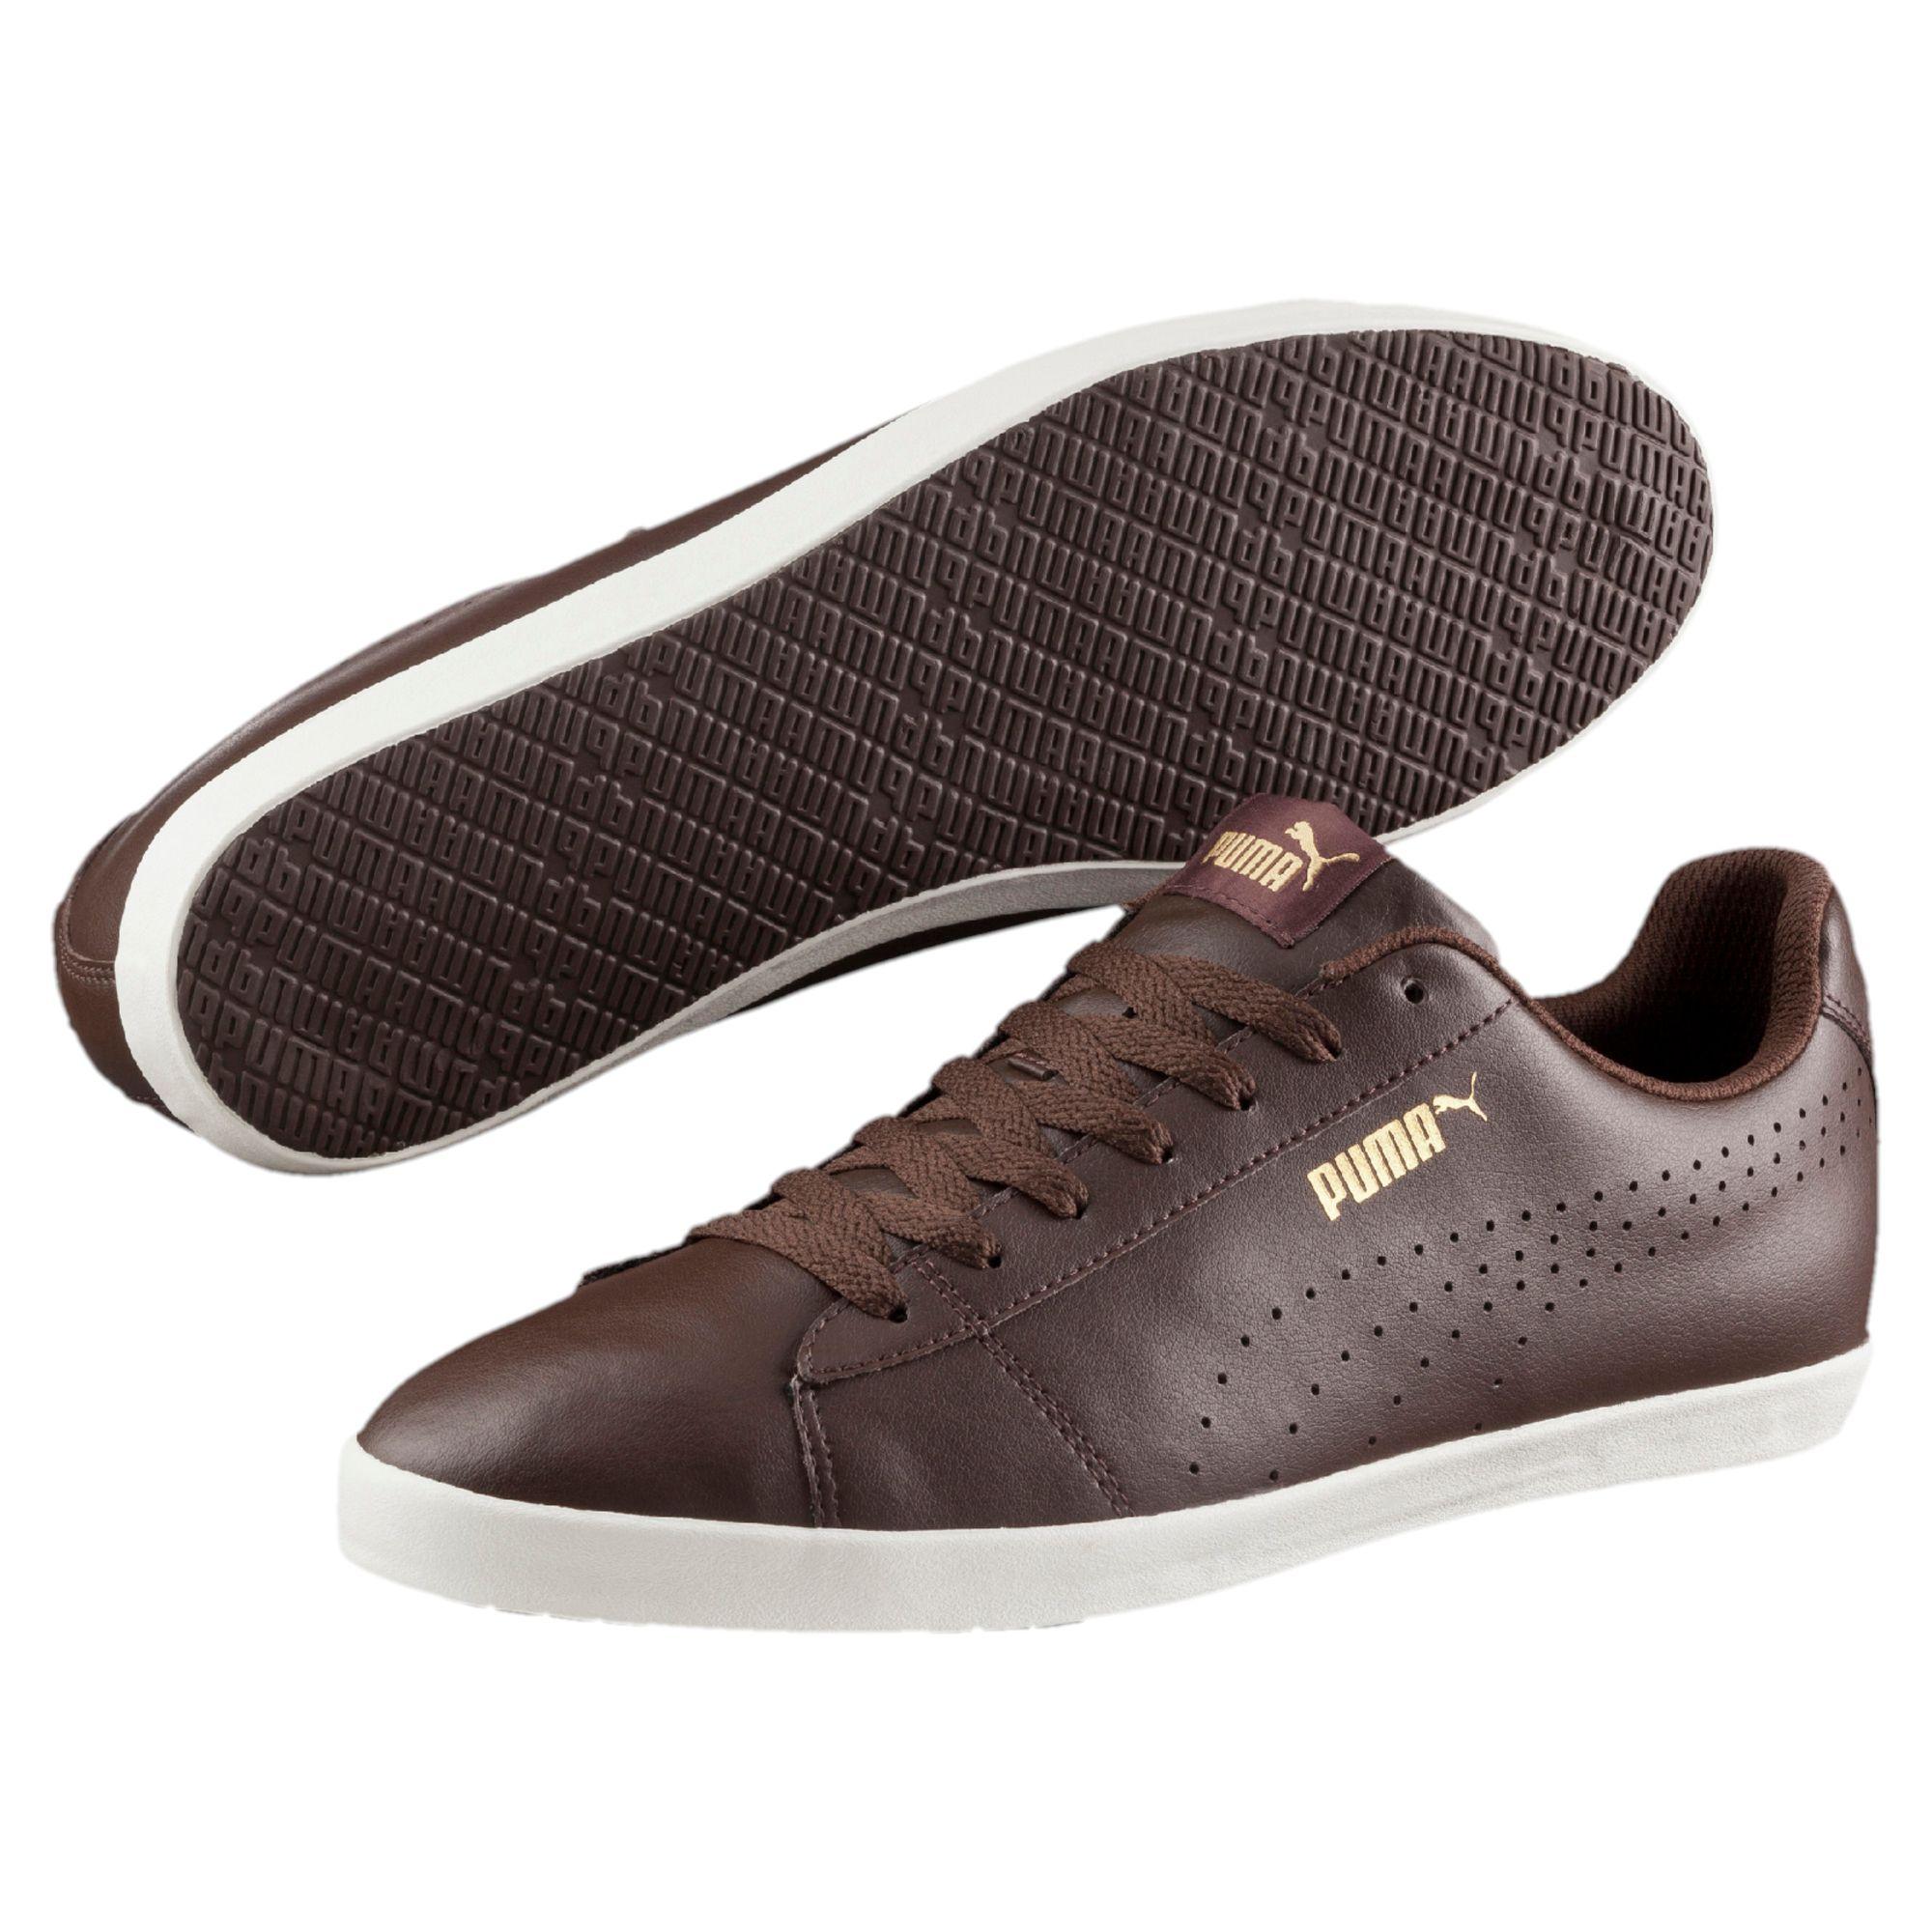 puma civilian sl sneaker sport classics schuhe m nner neu. Black Bedroom Furniture Sets. Home Design Ideas